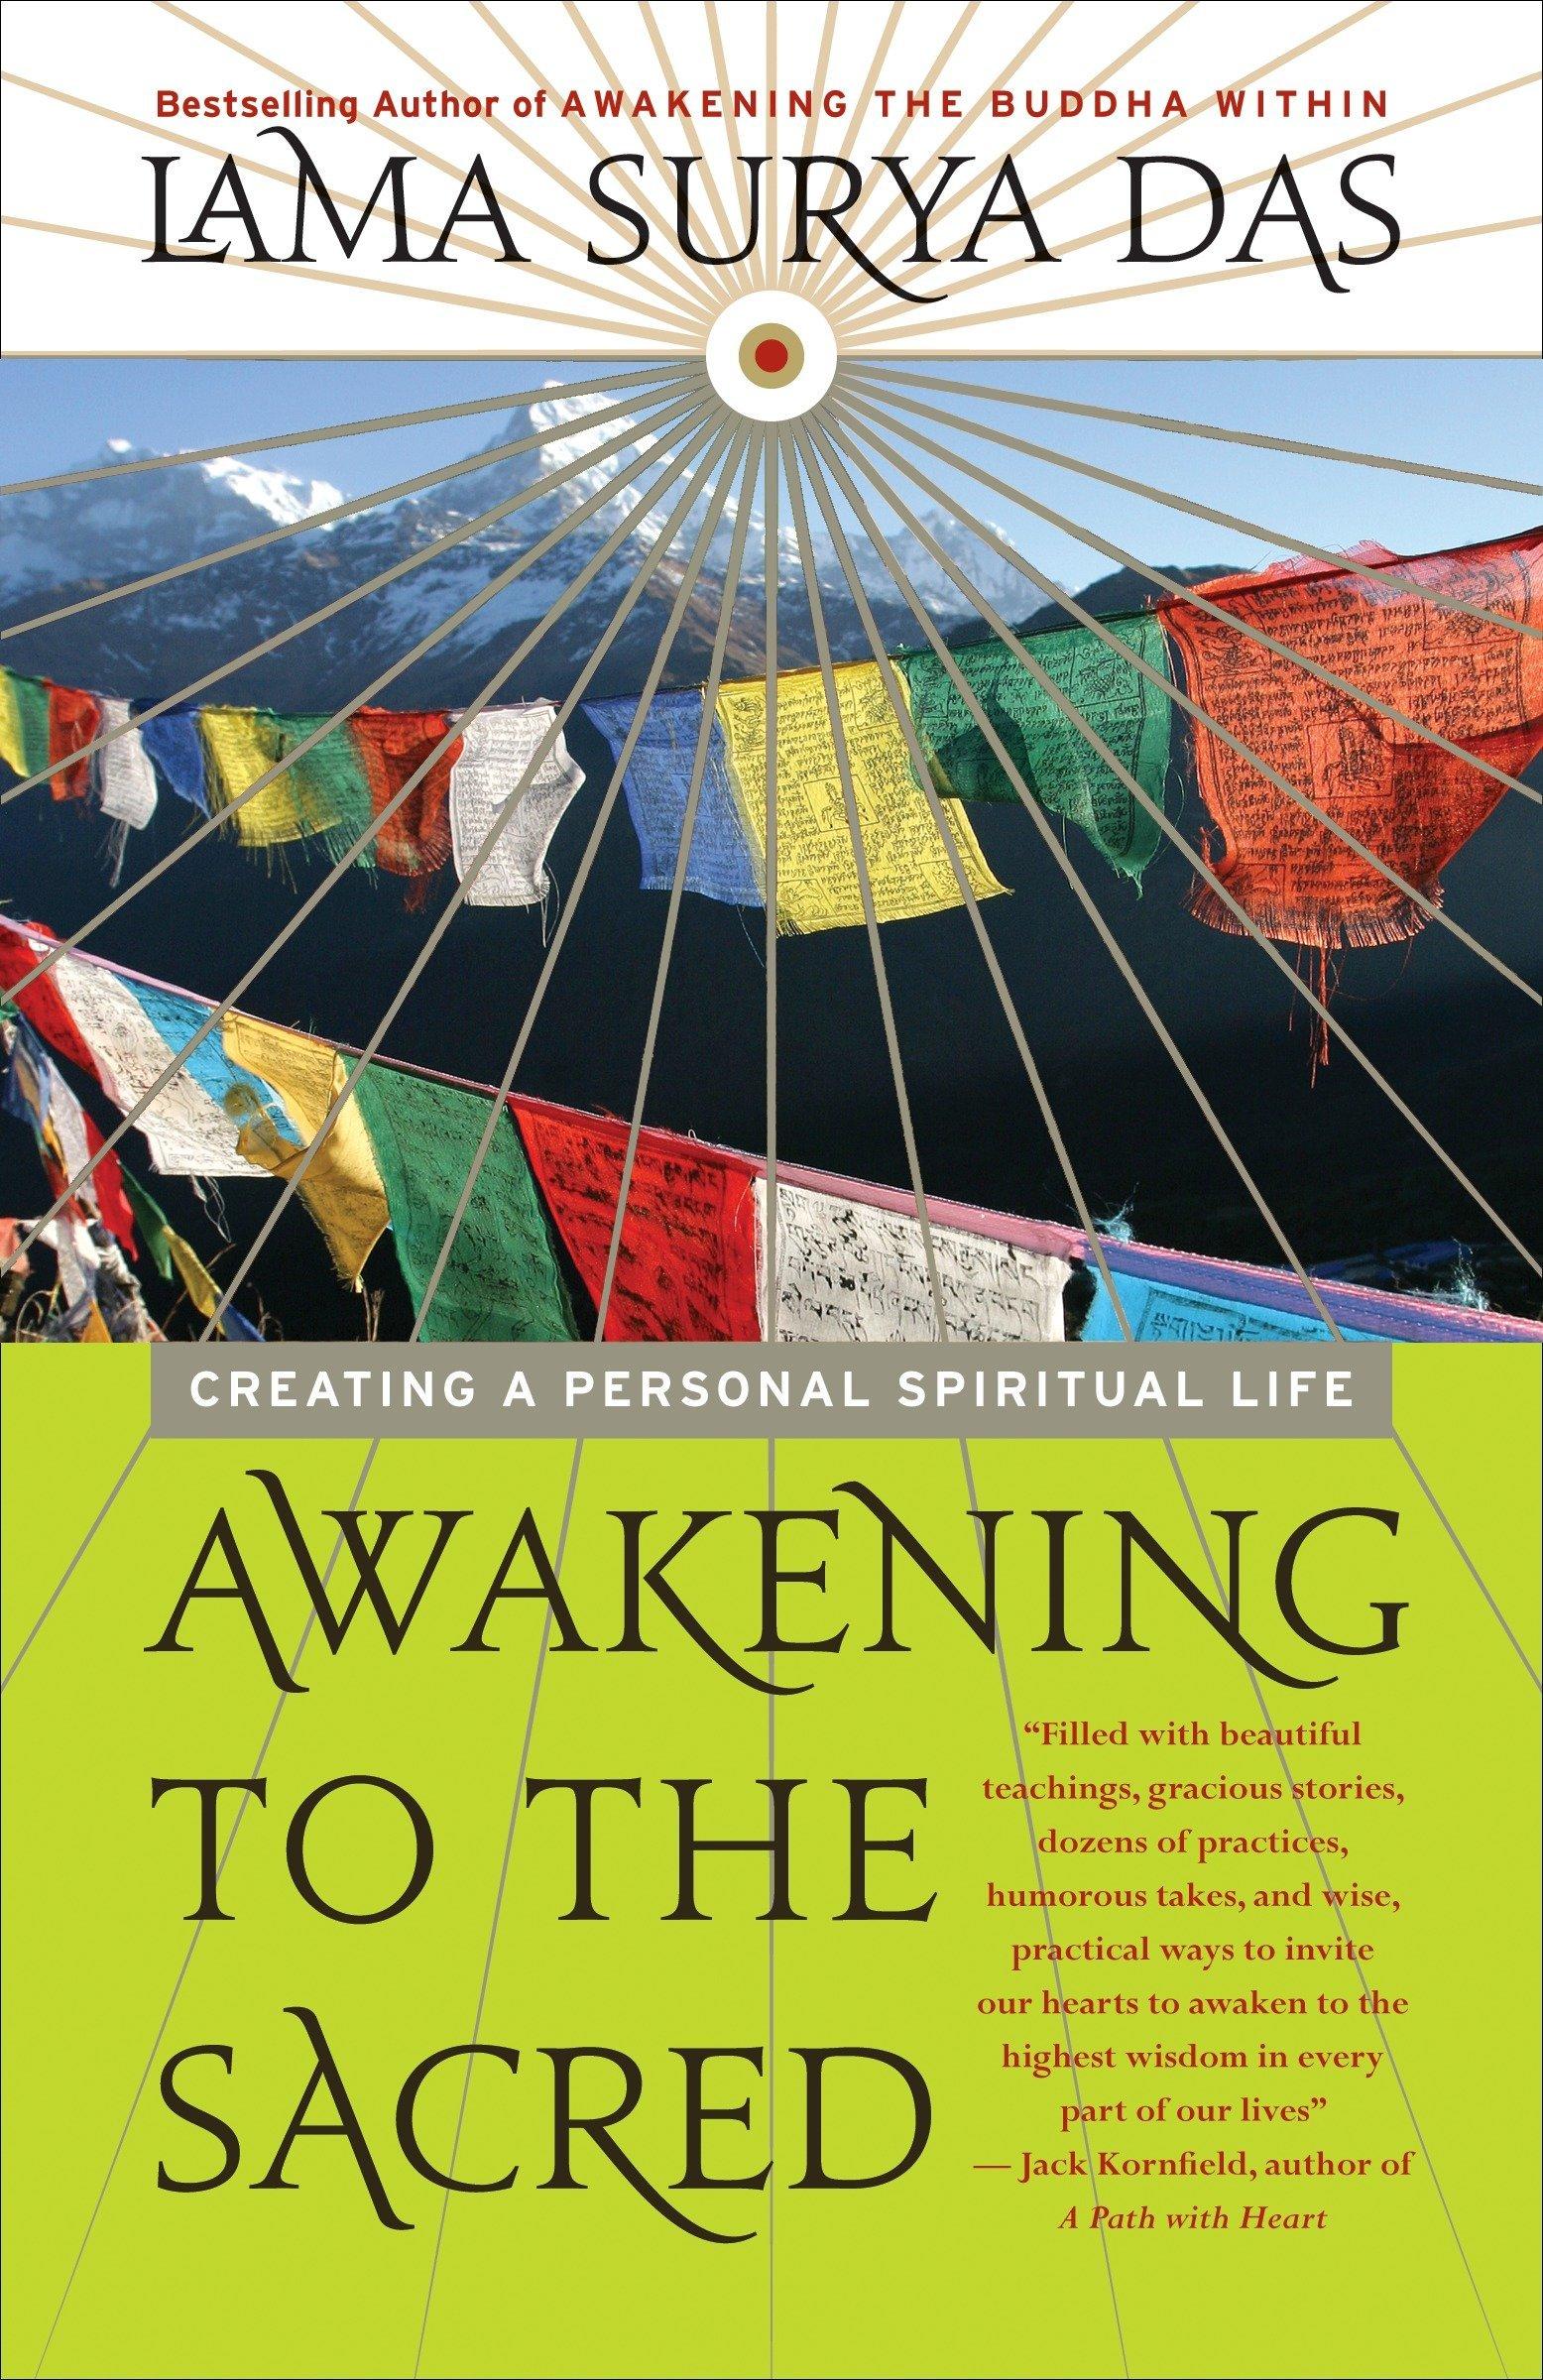 Awakening to the Sacred: Creating a Personal Spiritual Life: Lama Surya  Das: 9780767902755: Amazon.com: Books